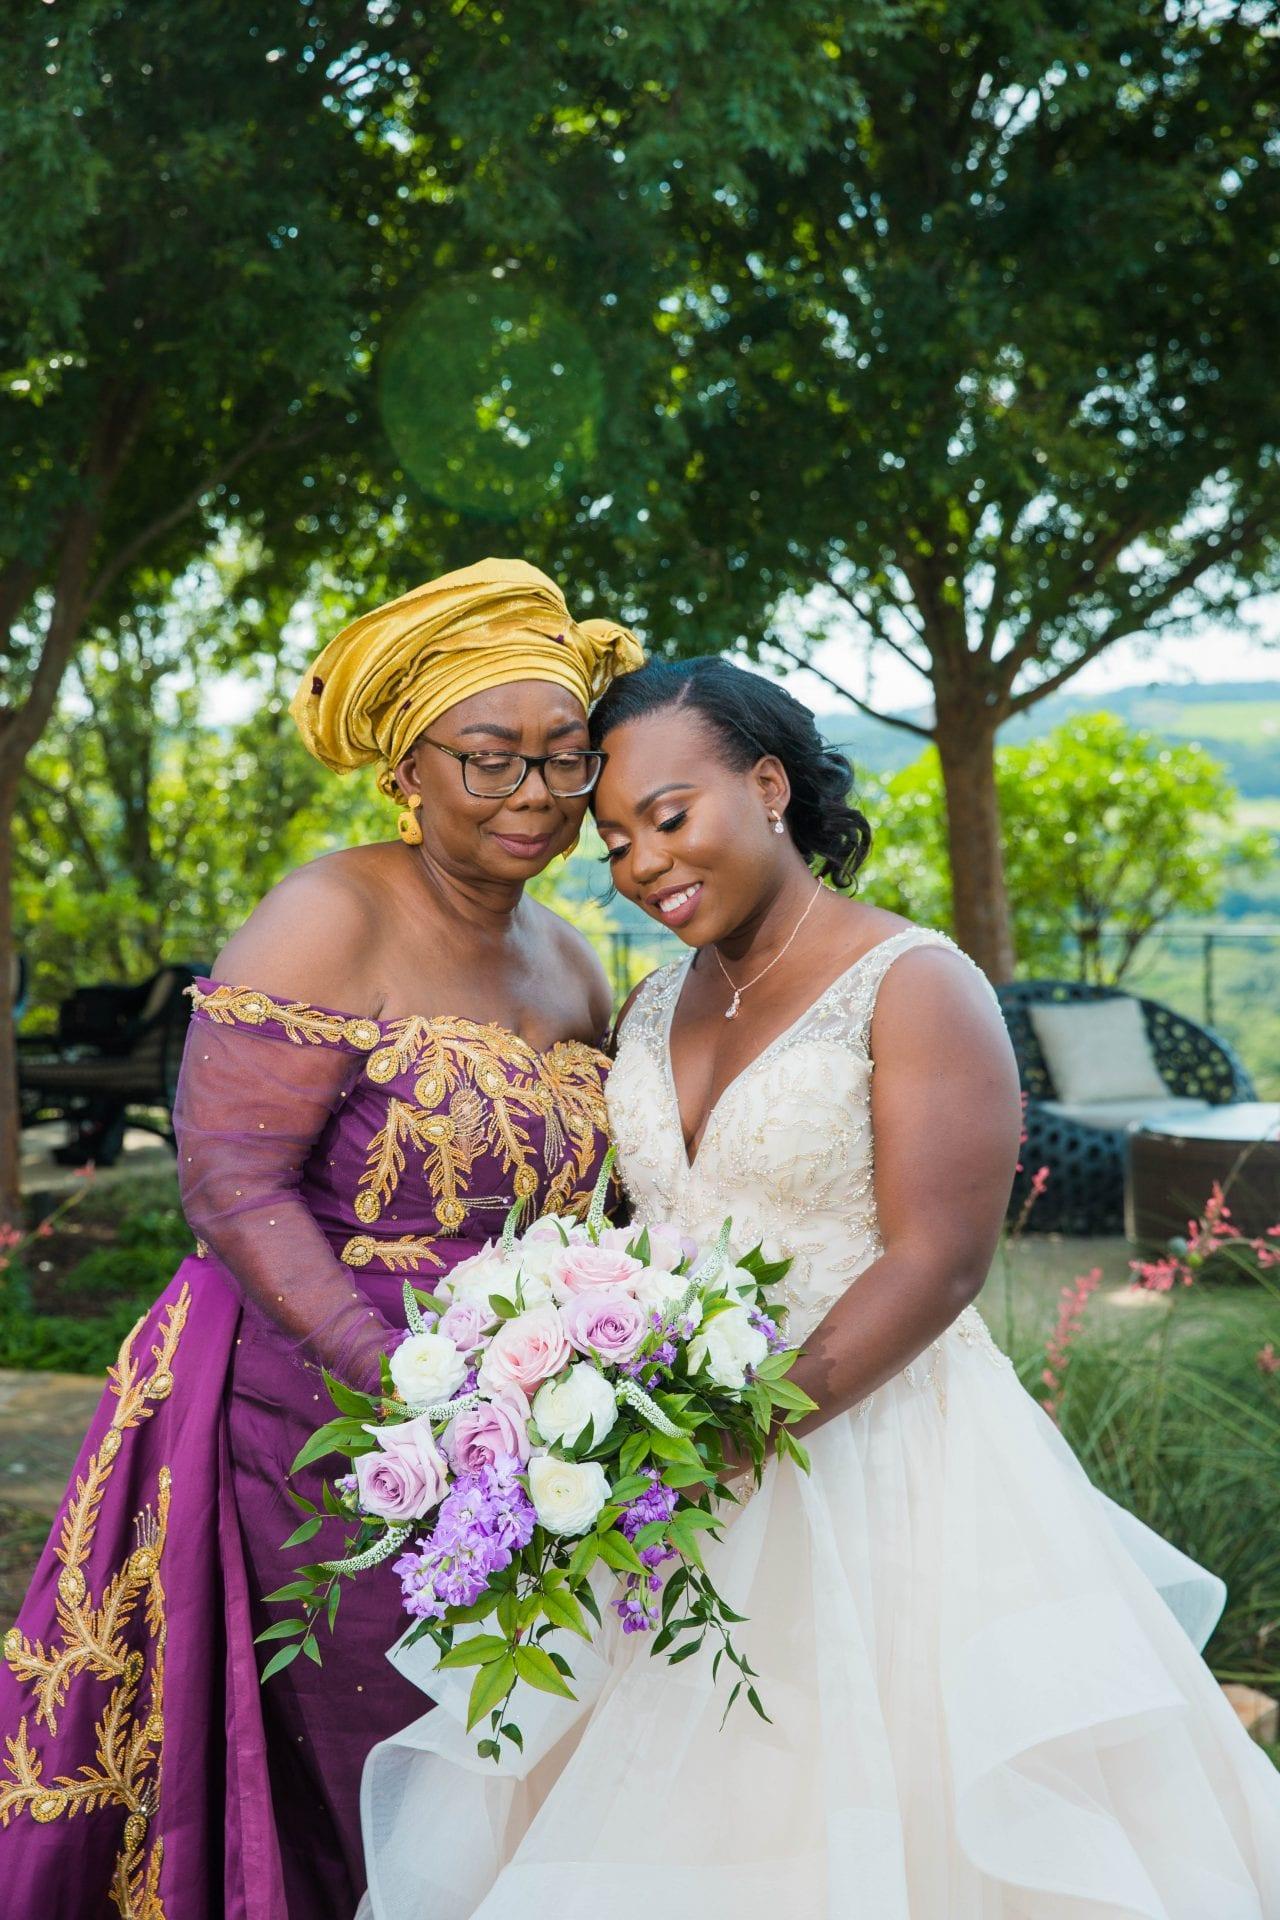 Onyema wedding La Cantera fmom and daughter